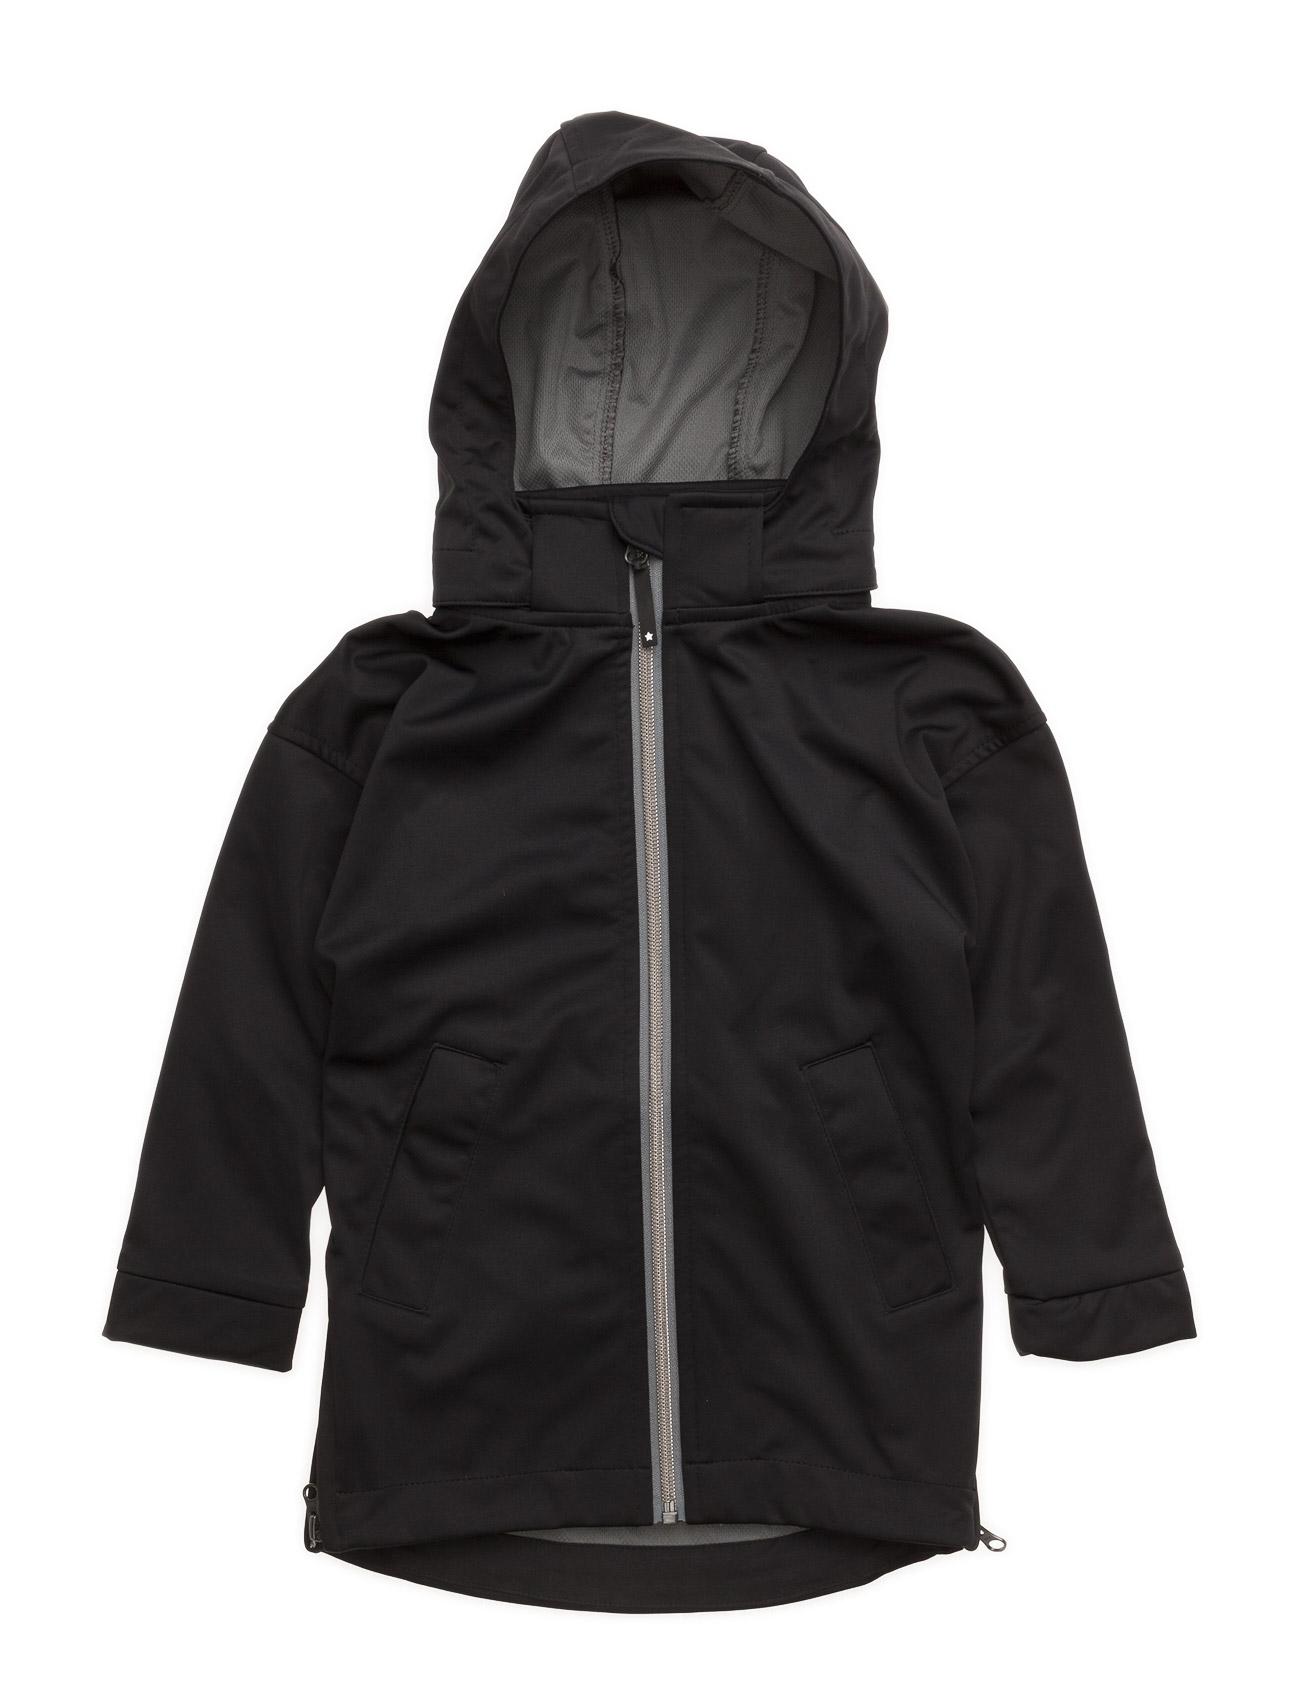 Holly Long Softshell Jacket, Waterproof 10.000mm